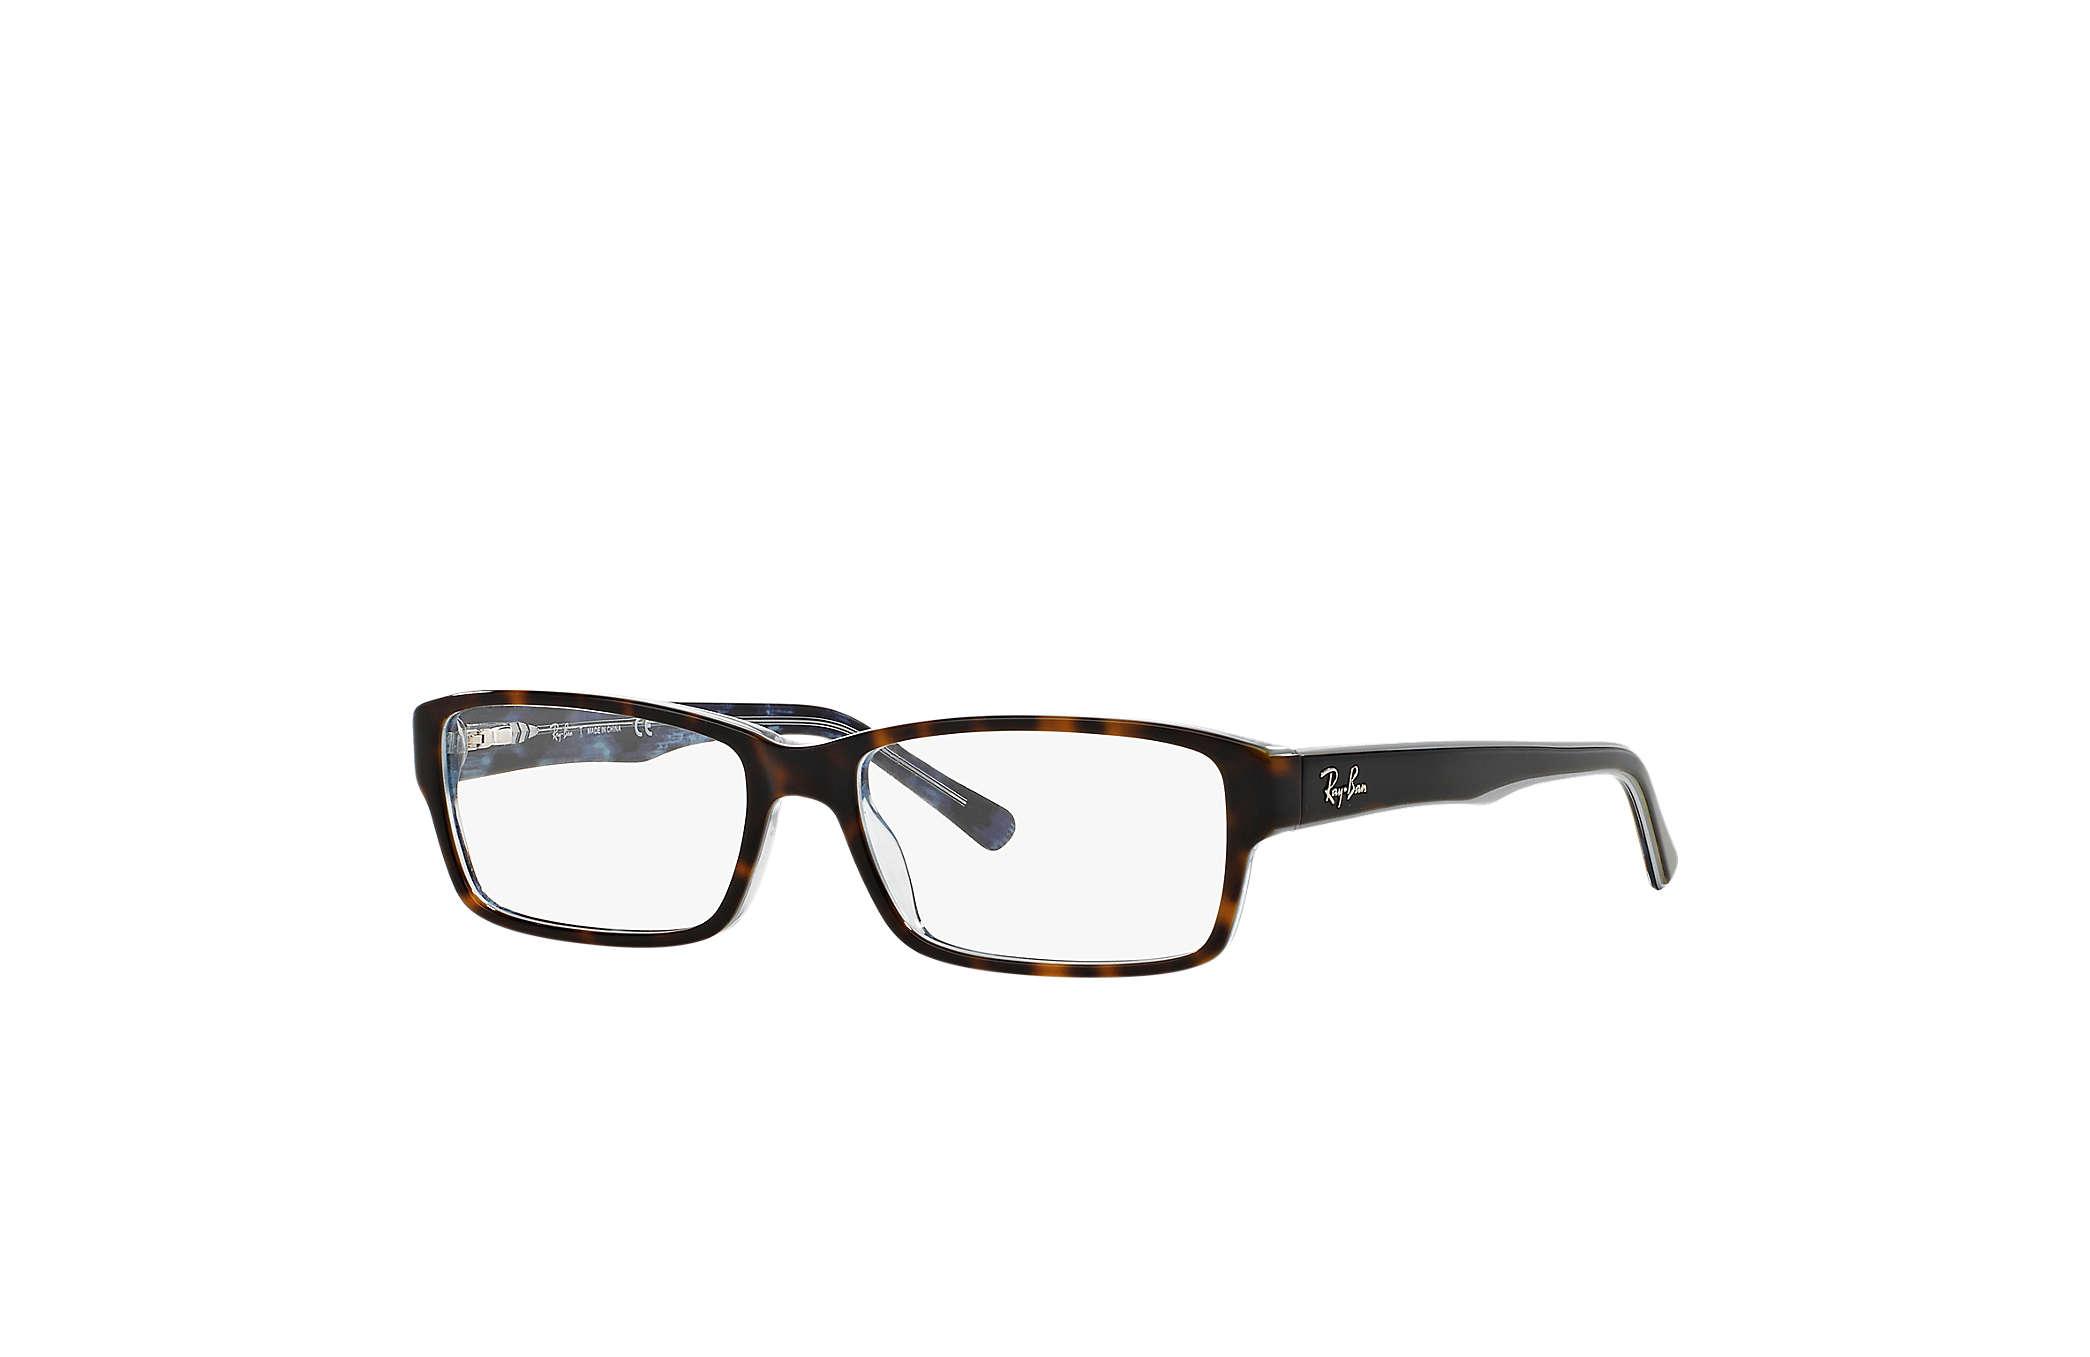 2cd3e187e1 Ray-Ban prescription glasses RB5169 Tortoise - Acetate ...